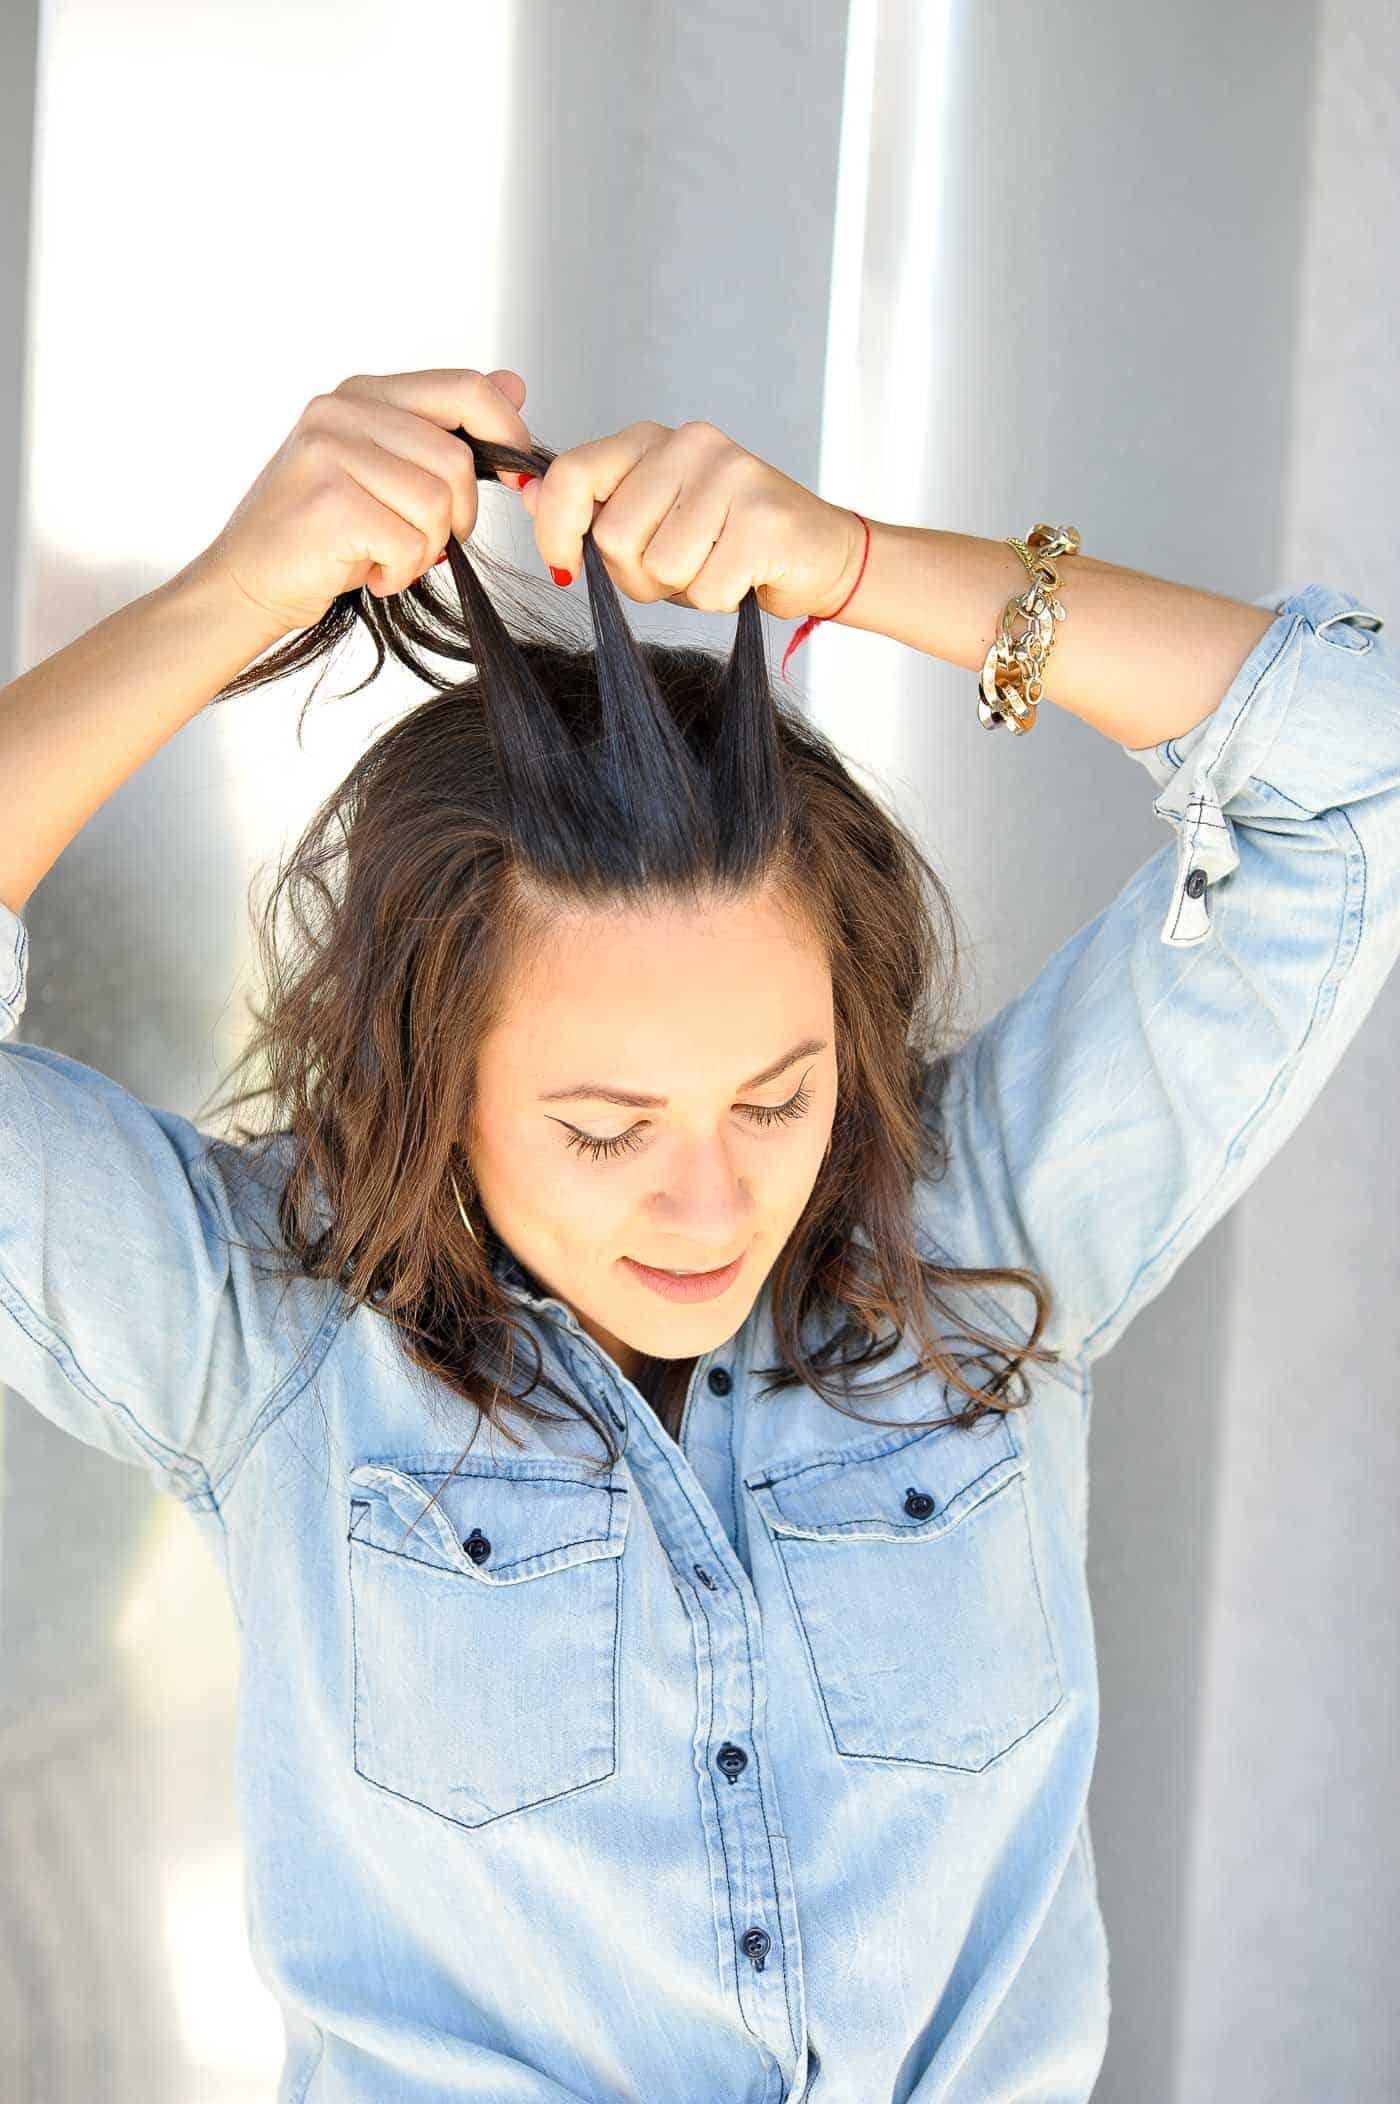 braided half up half down hairstyle - how to braid your hair - My Style Vita @mystylevita